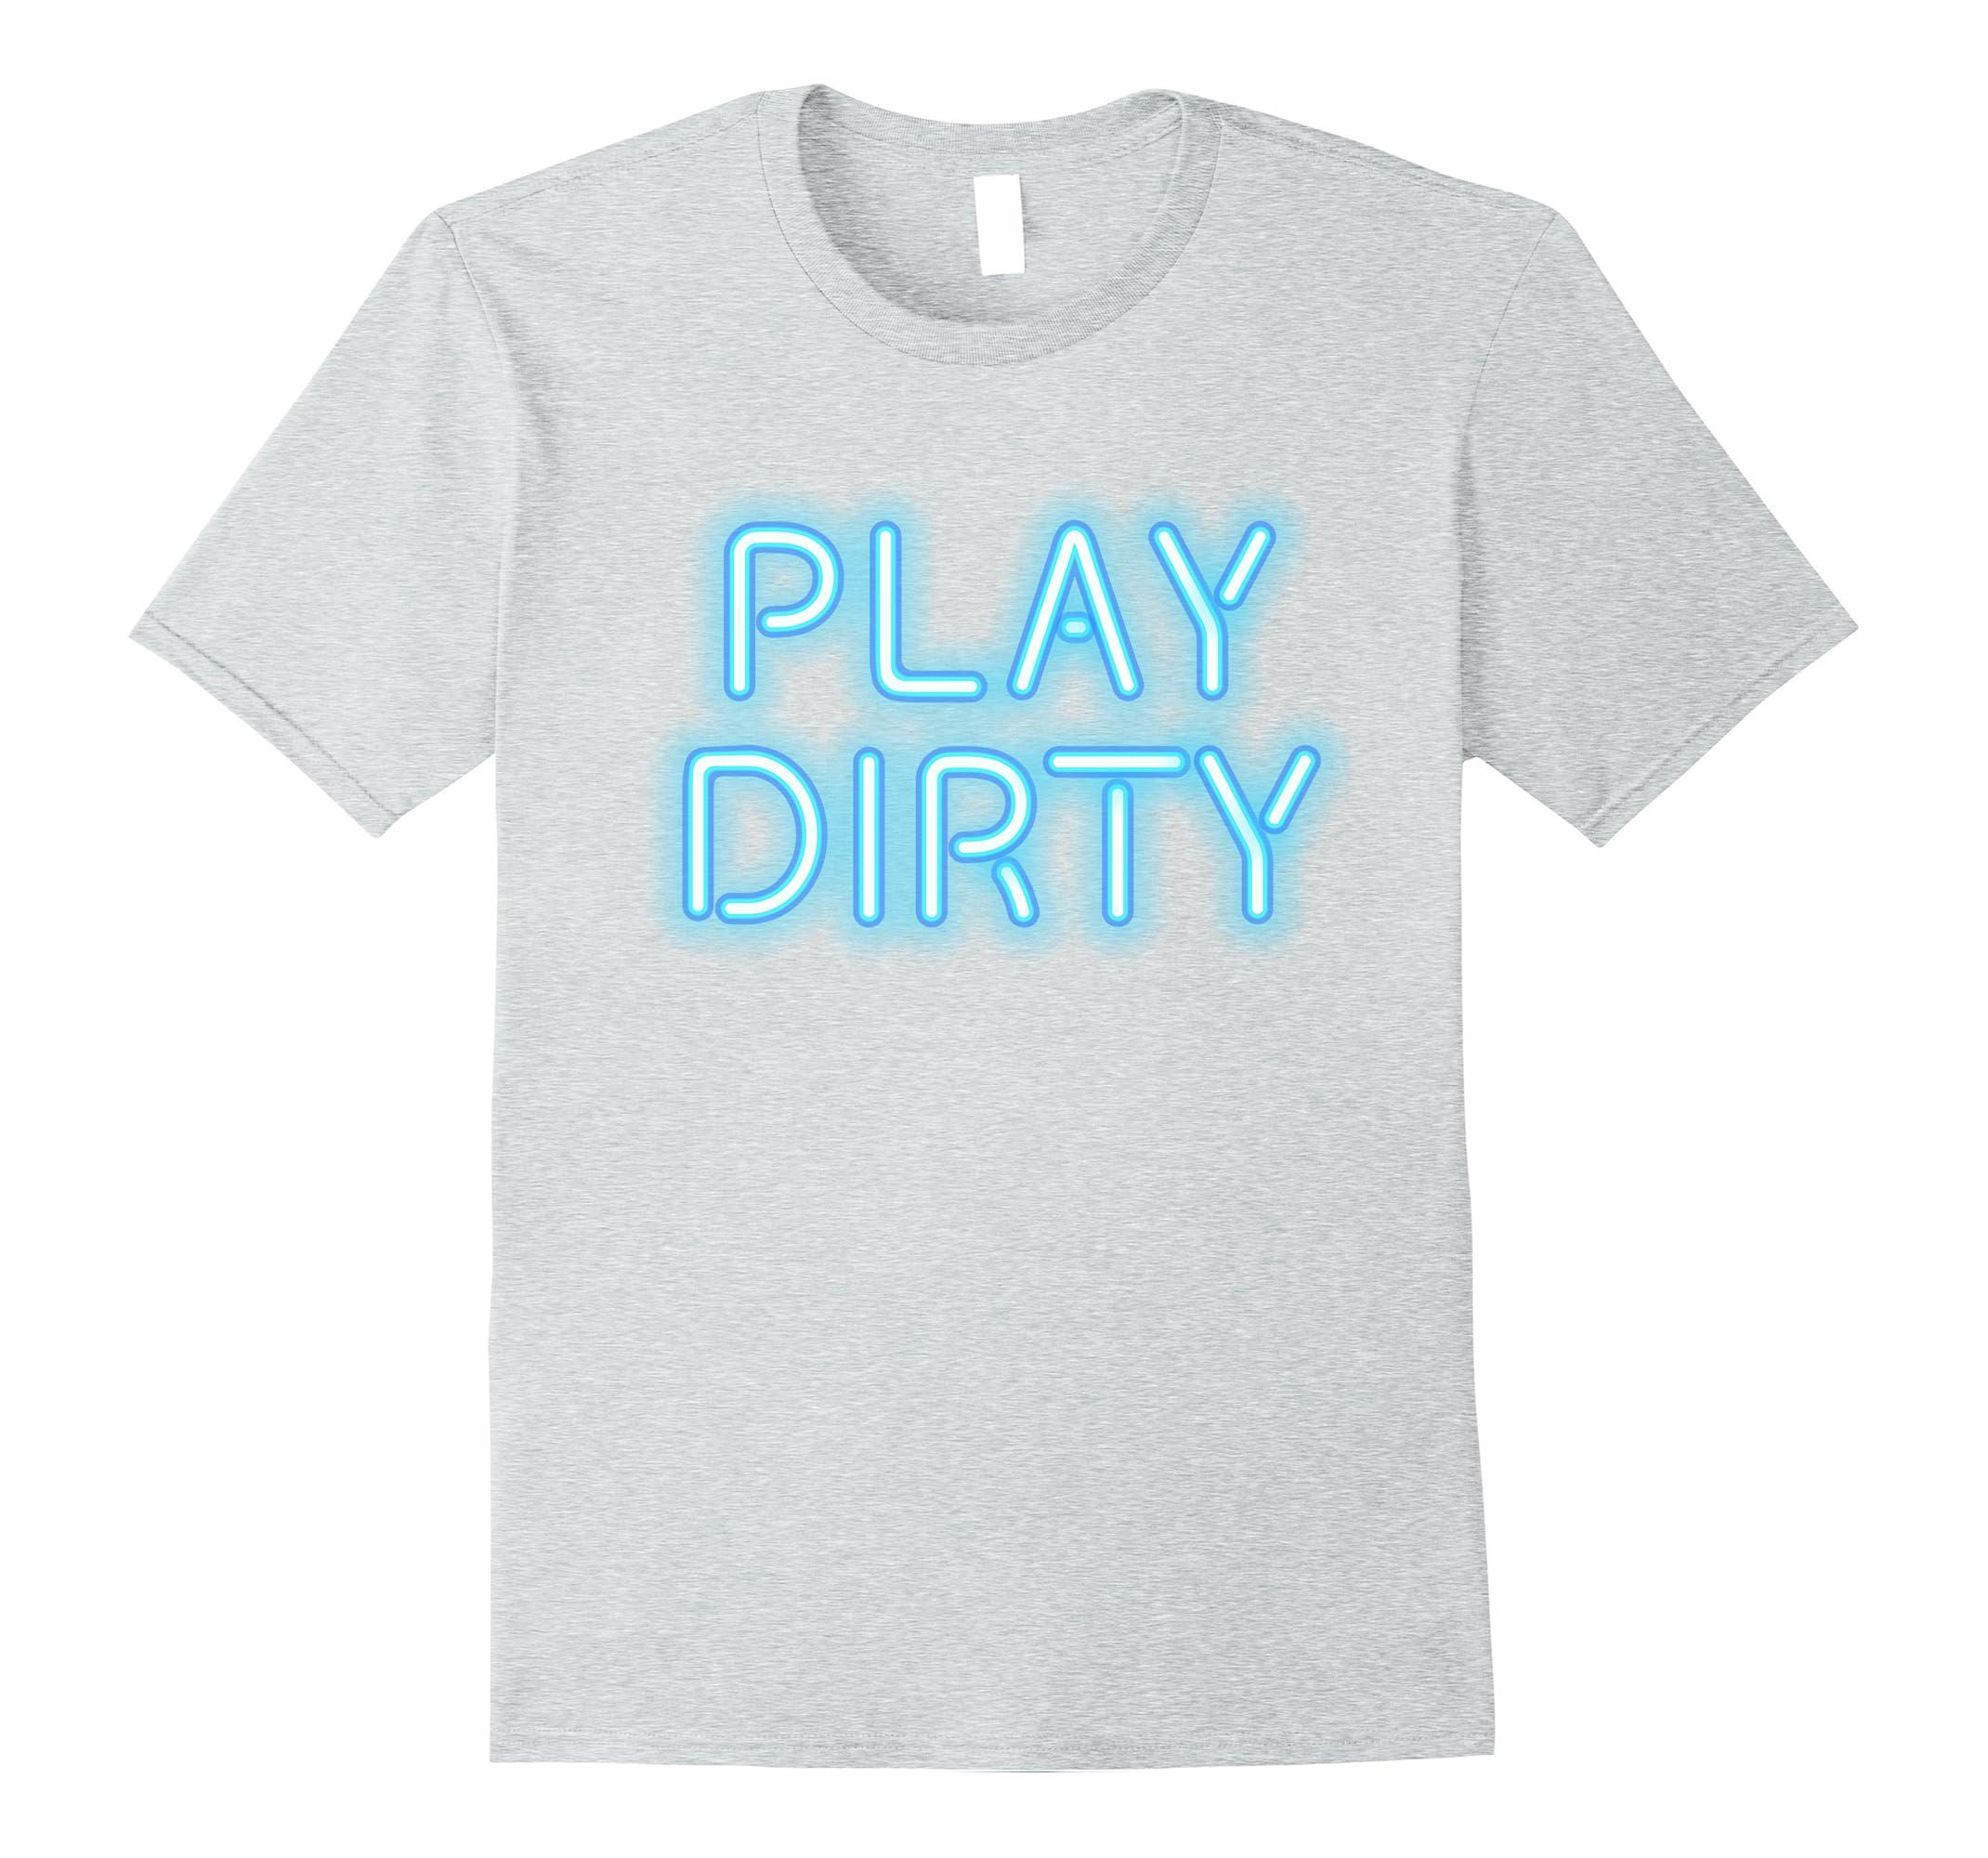 09bdba717 Play Dirty Retro 80's Neon Letter Graphic Tee T Shirt-RT – Rateeshirt